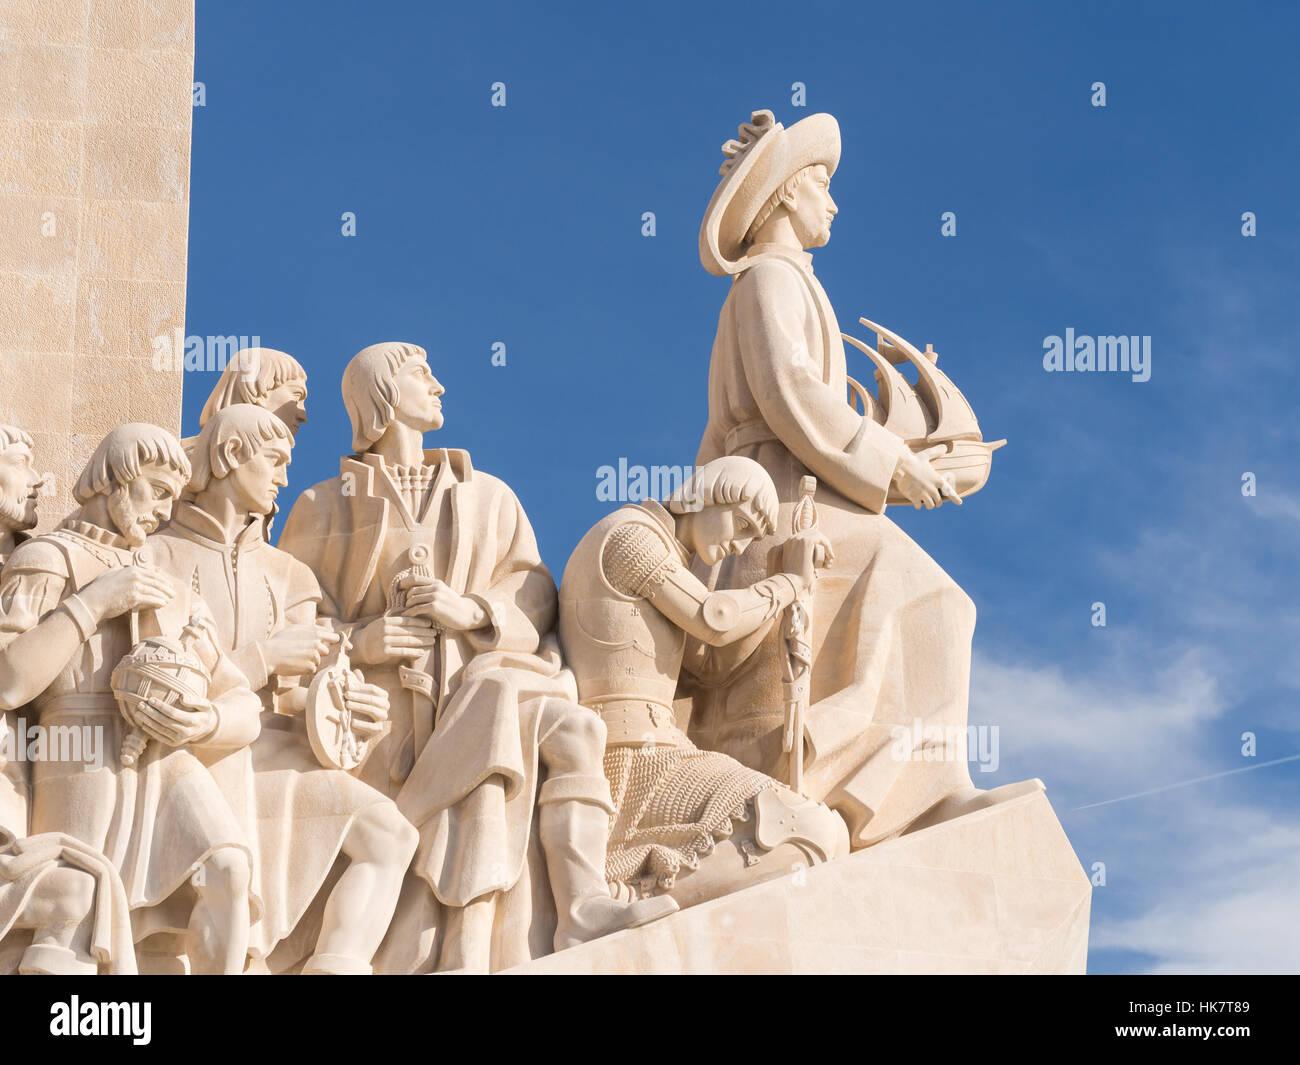 Denkmal der Entdeckungen der neuen Welt in Belem, Lissabon, Portugal. Stockbild